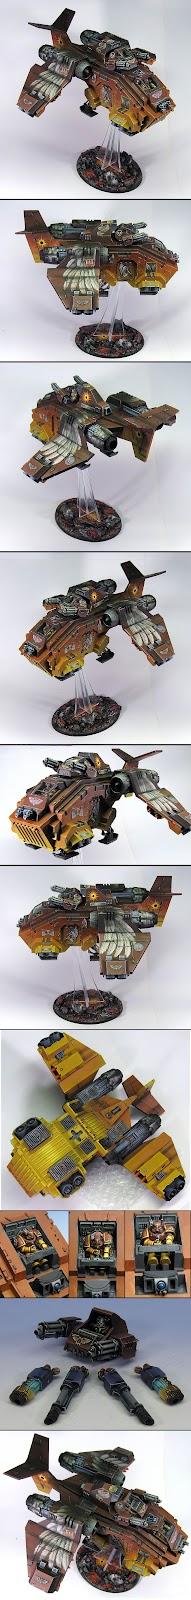 StormRaven de los Angels Solaris de Warhammer 40000